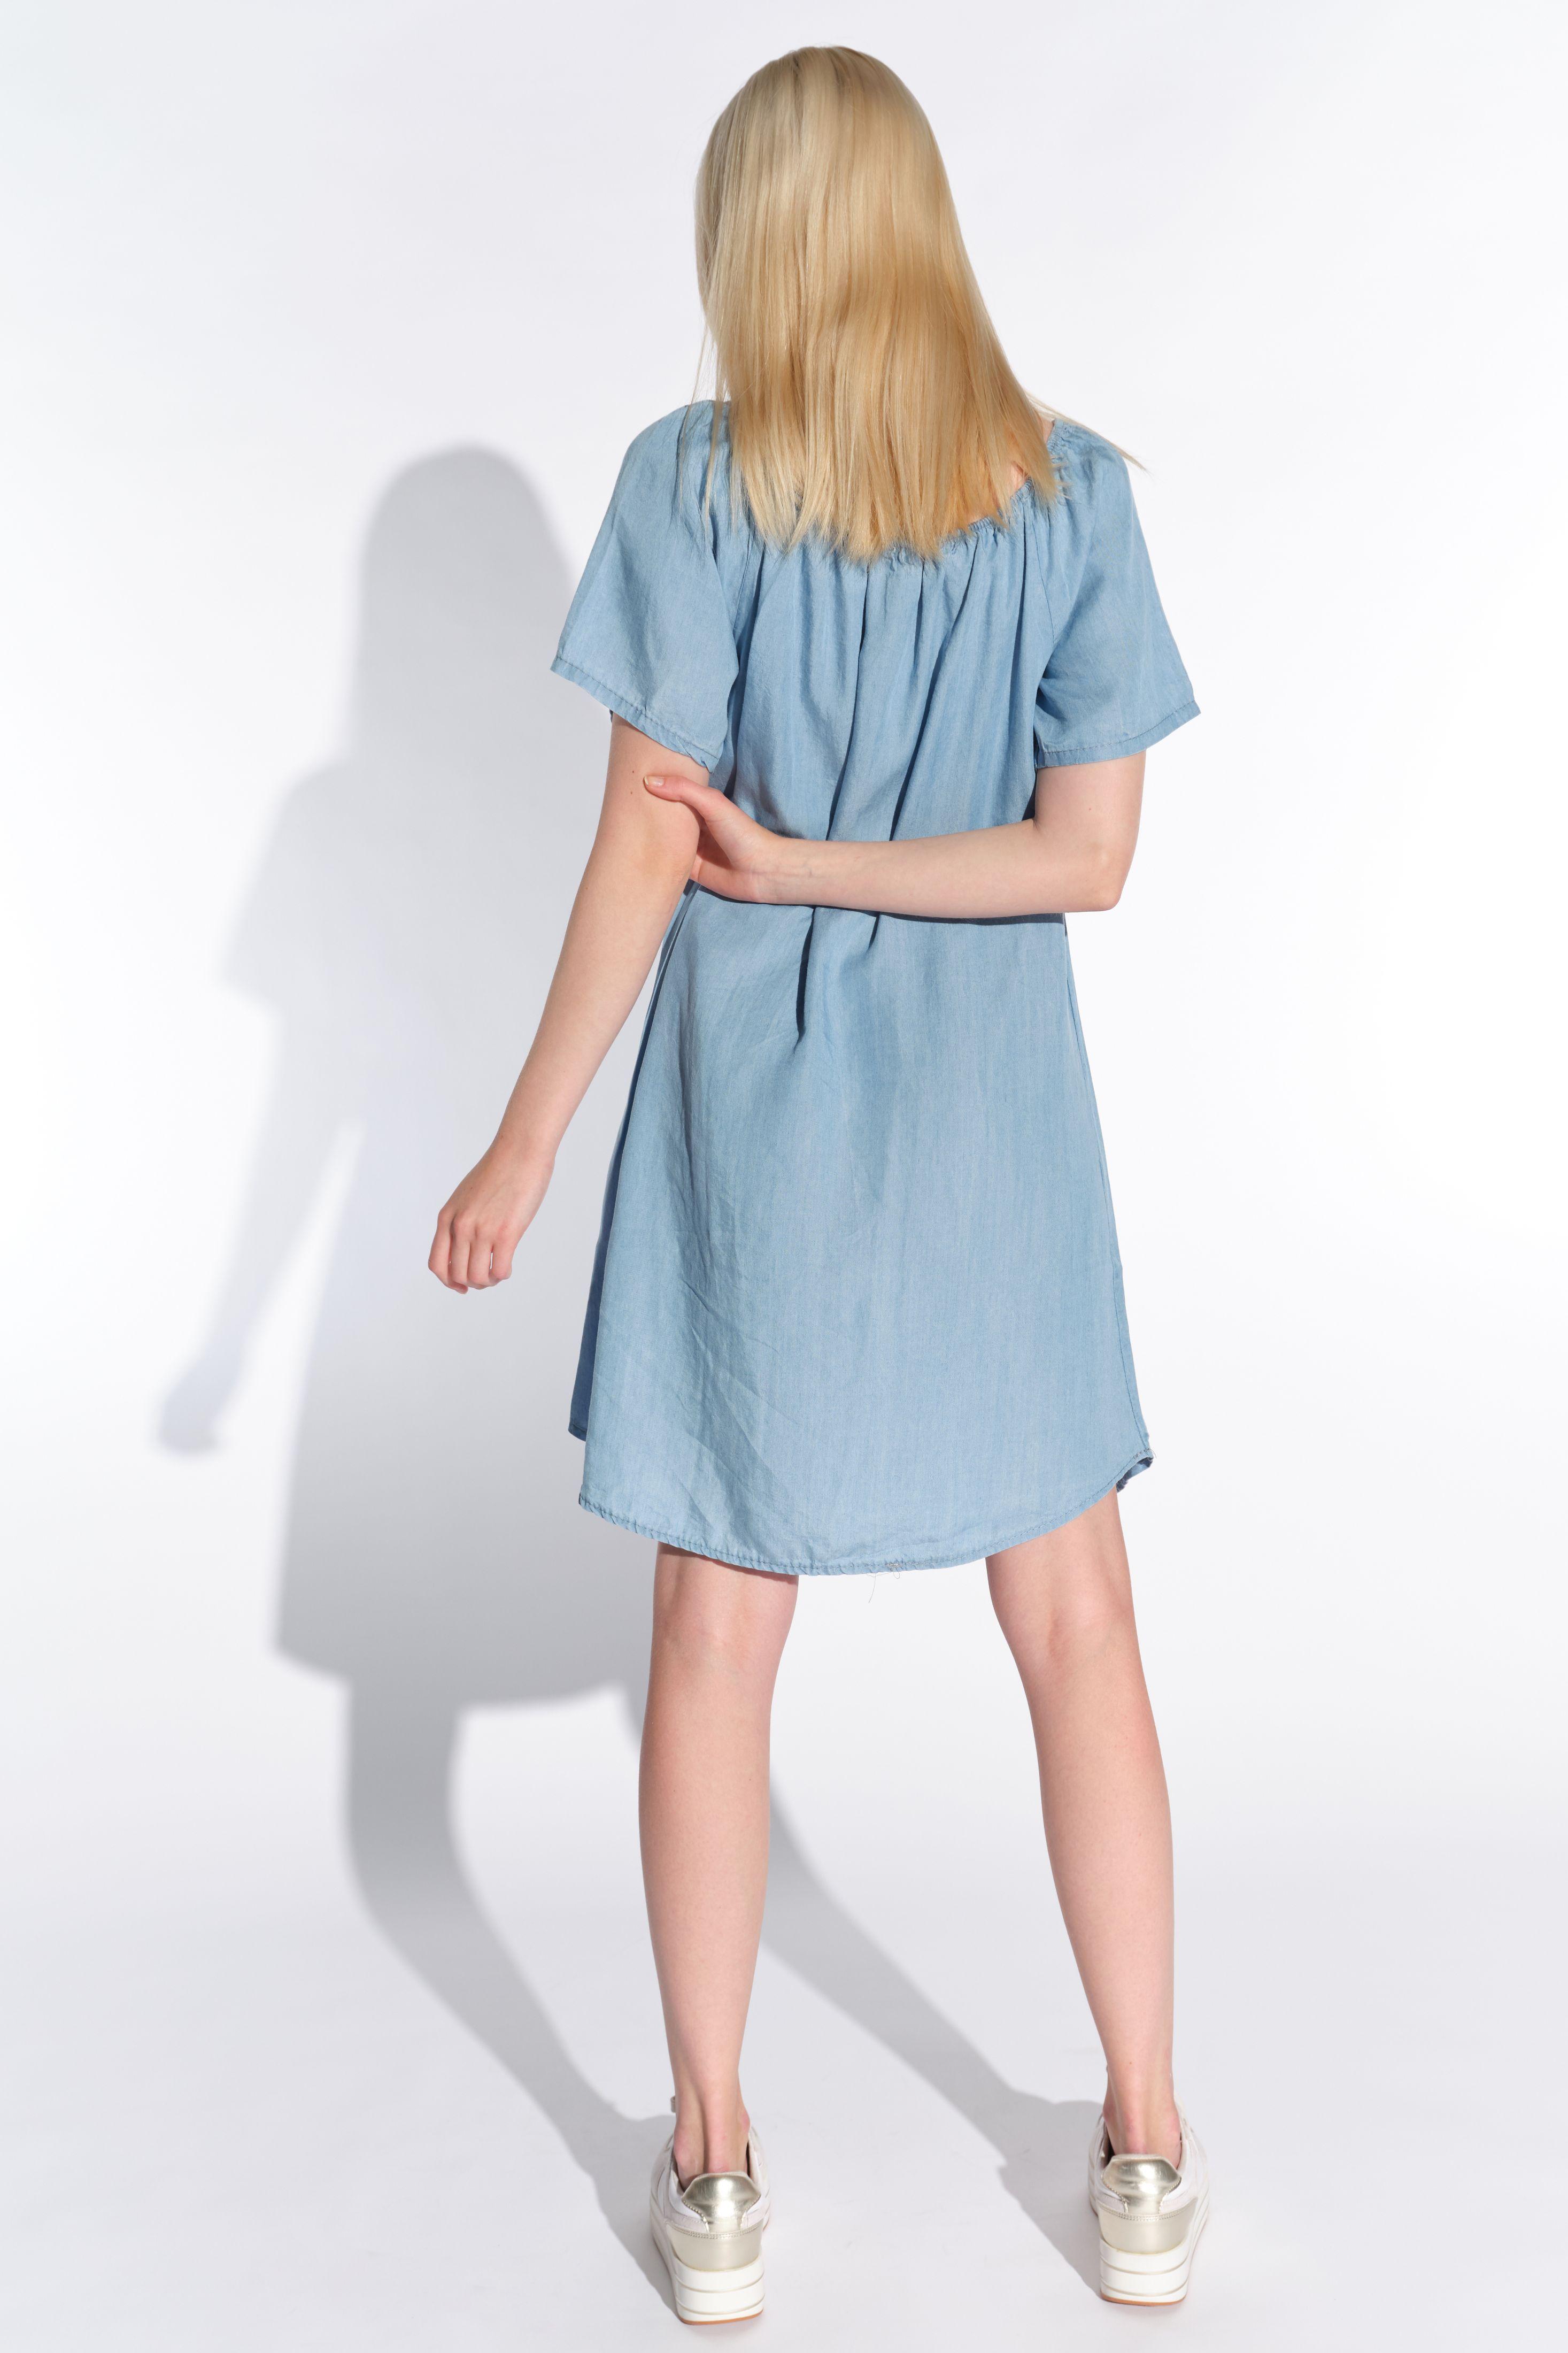 Vestino-Damen-Tunika-Kleid-Mini-Kleid-Jeans-Look-Kurzarm-Tunika-Offshoulder Indexbild 6